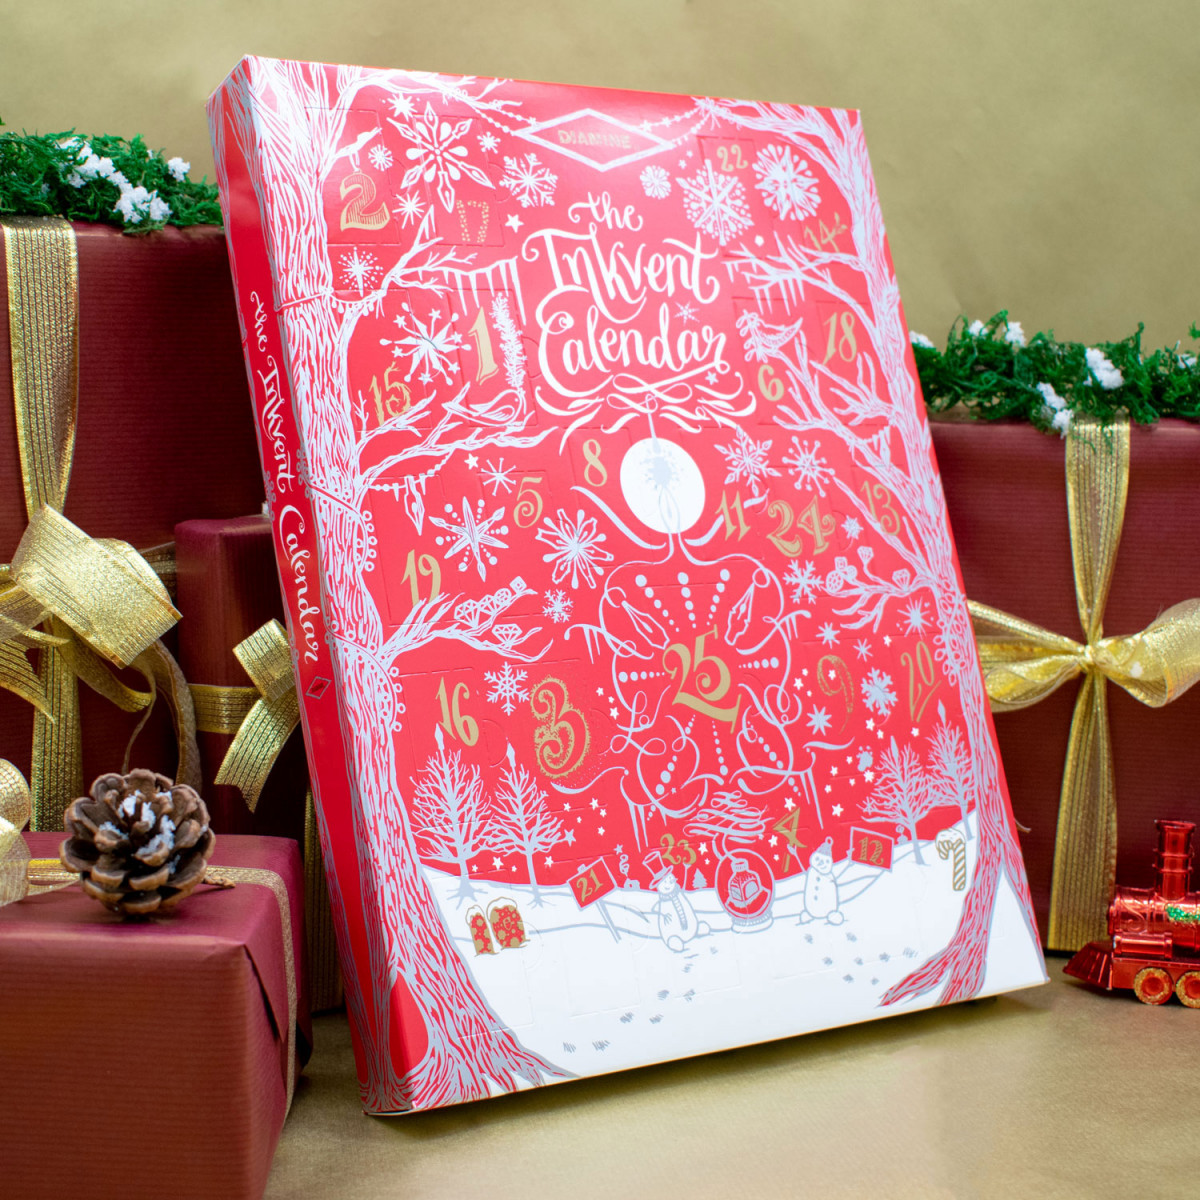 Diamine Inkvent Calendar - Festive Themed (Limited Edition)